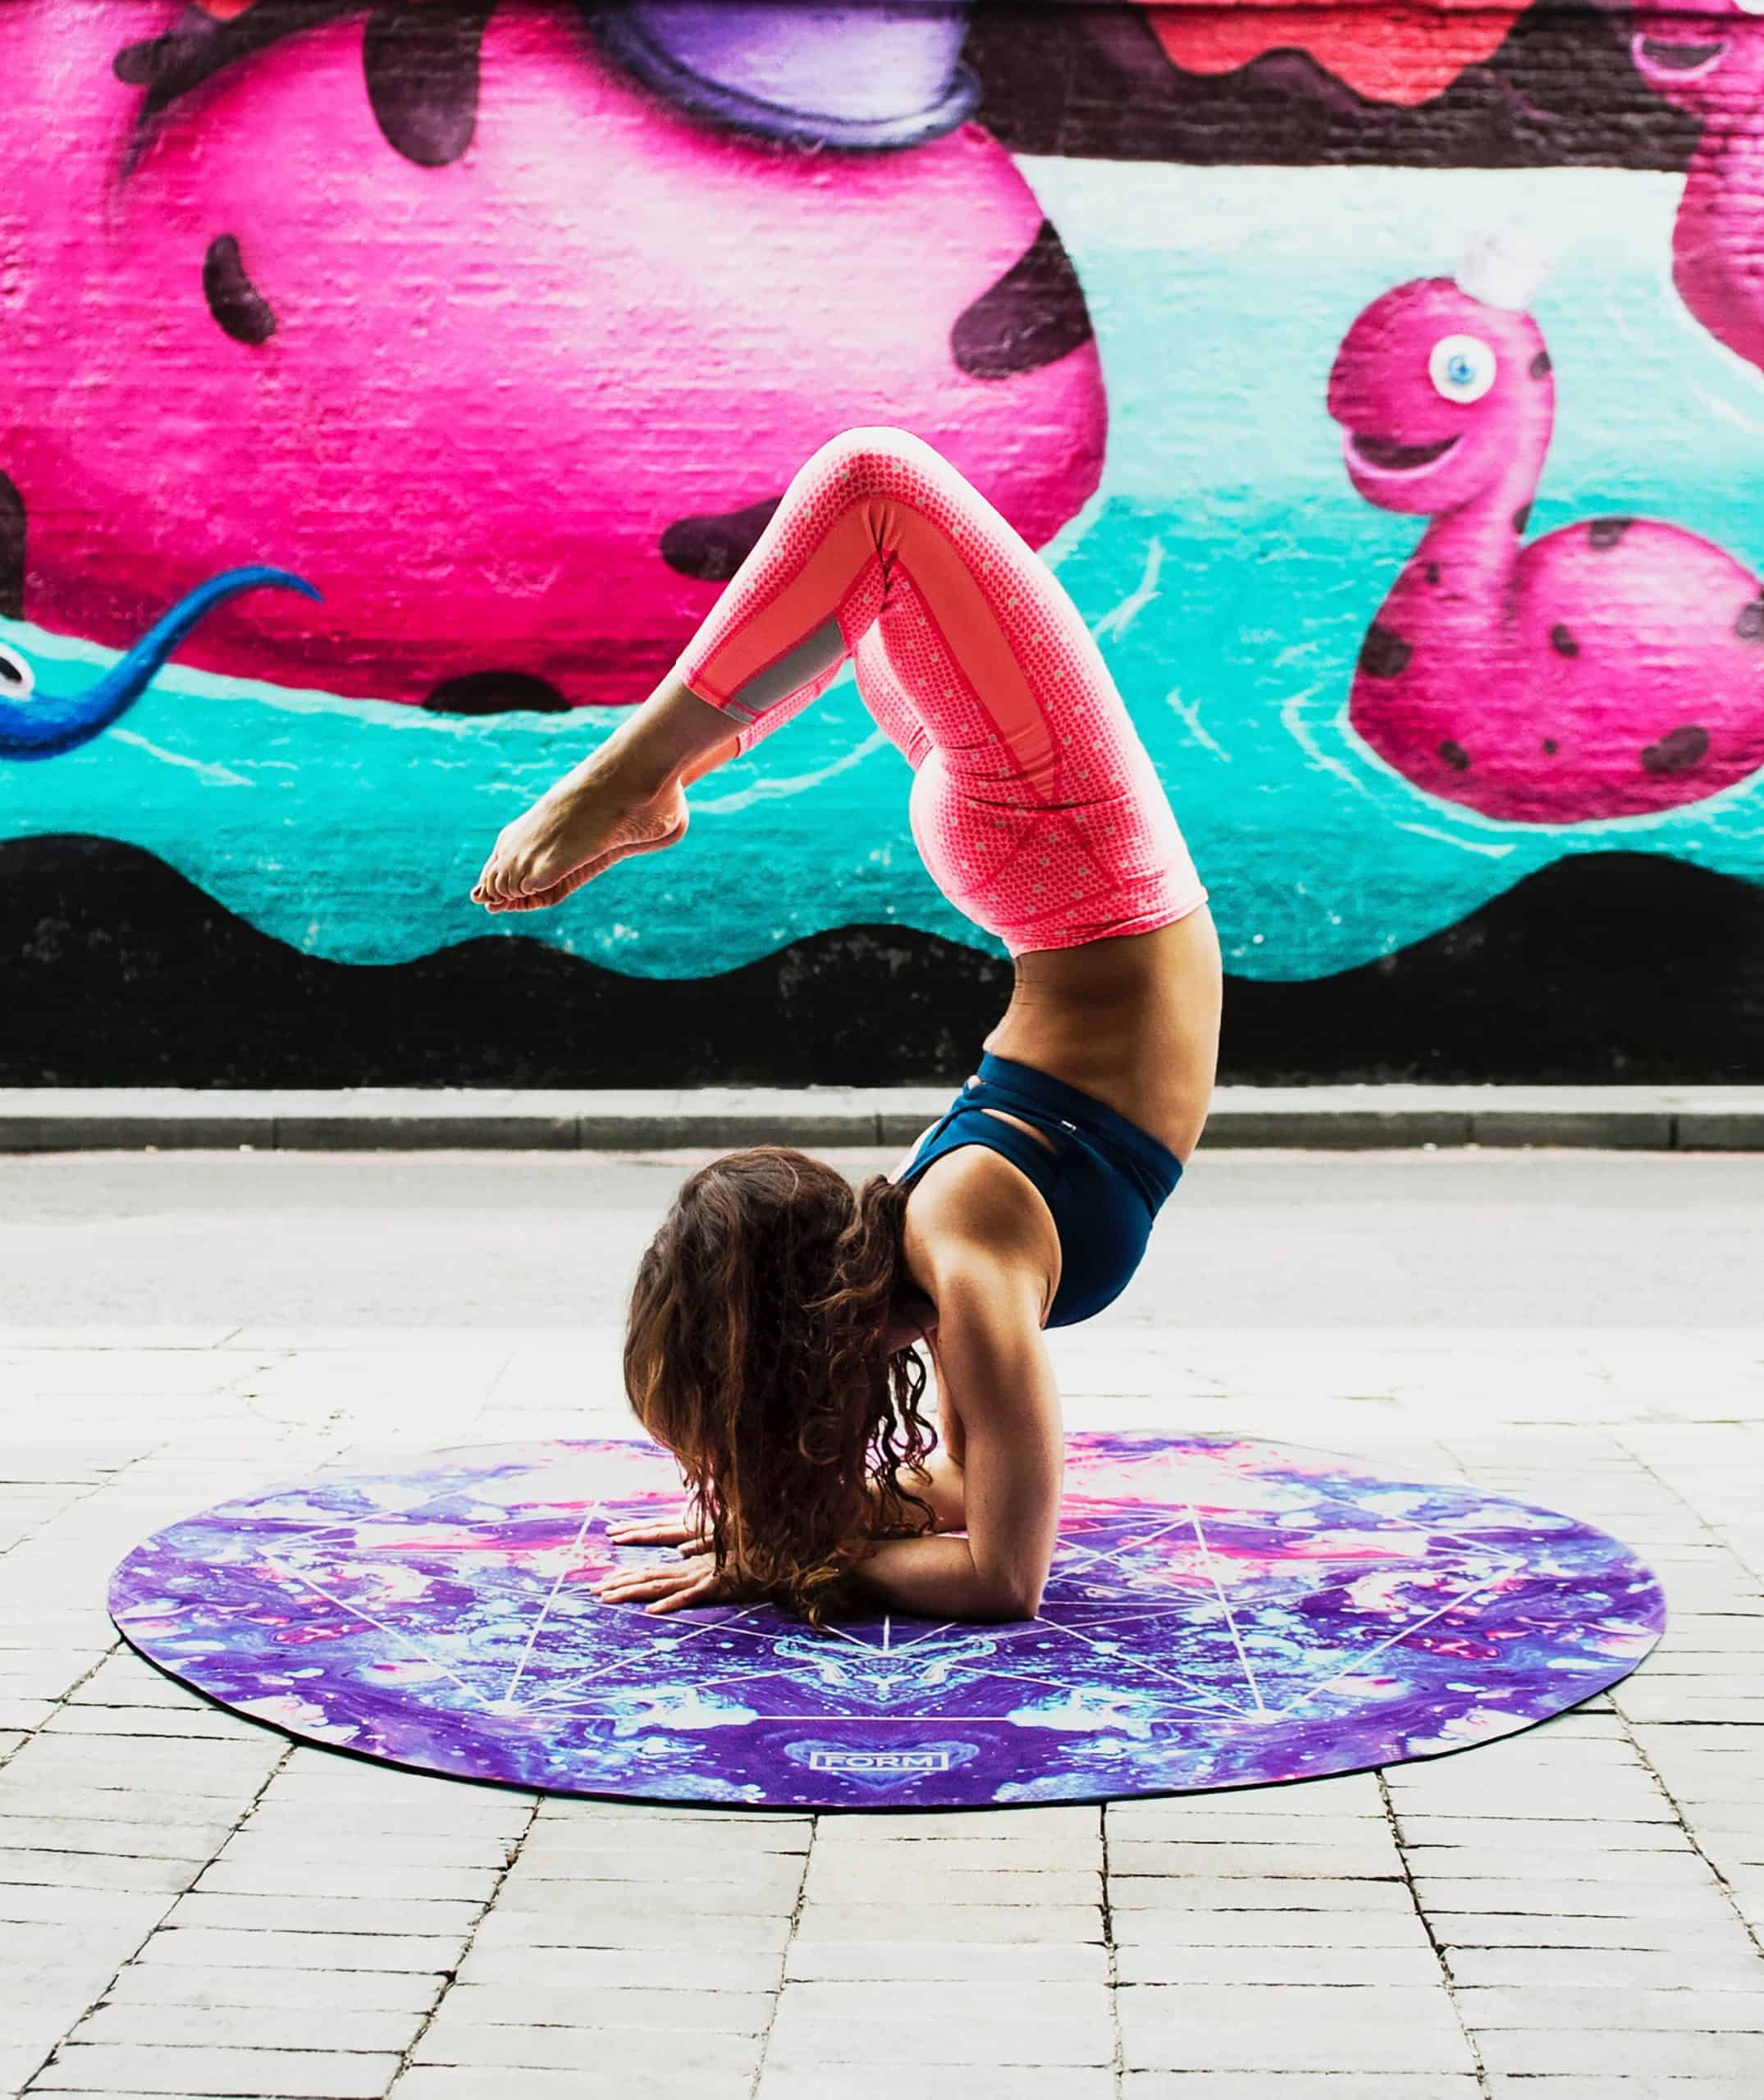 Workout Leggings For Women: Advantages And Disadvantages